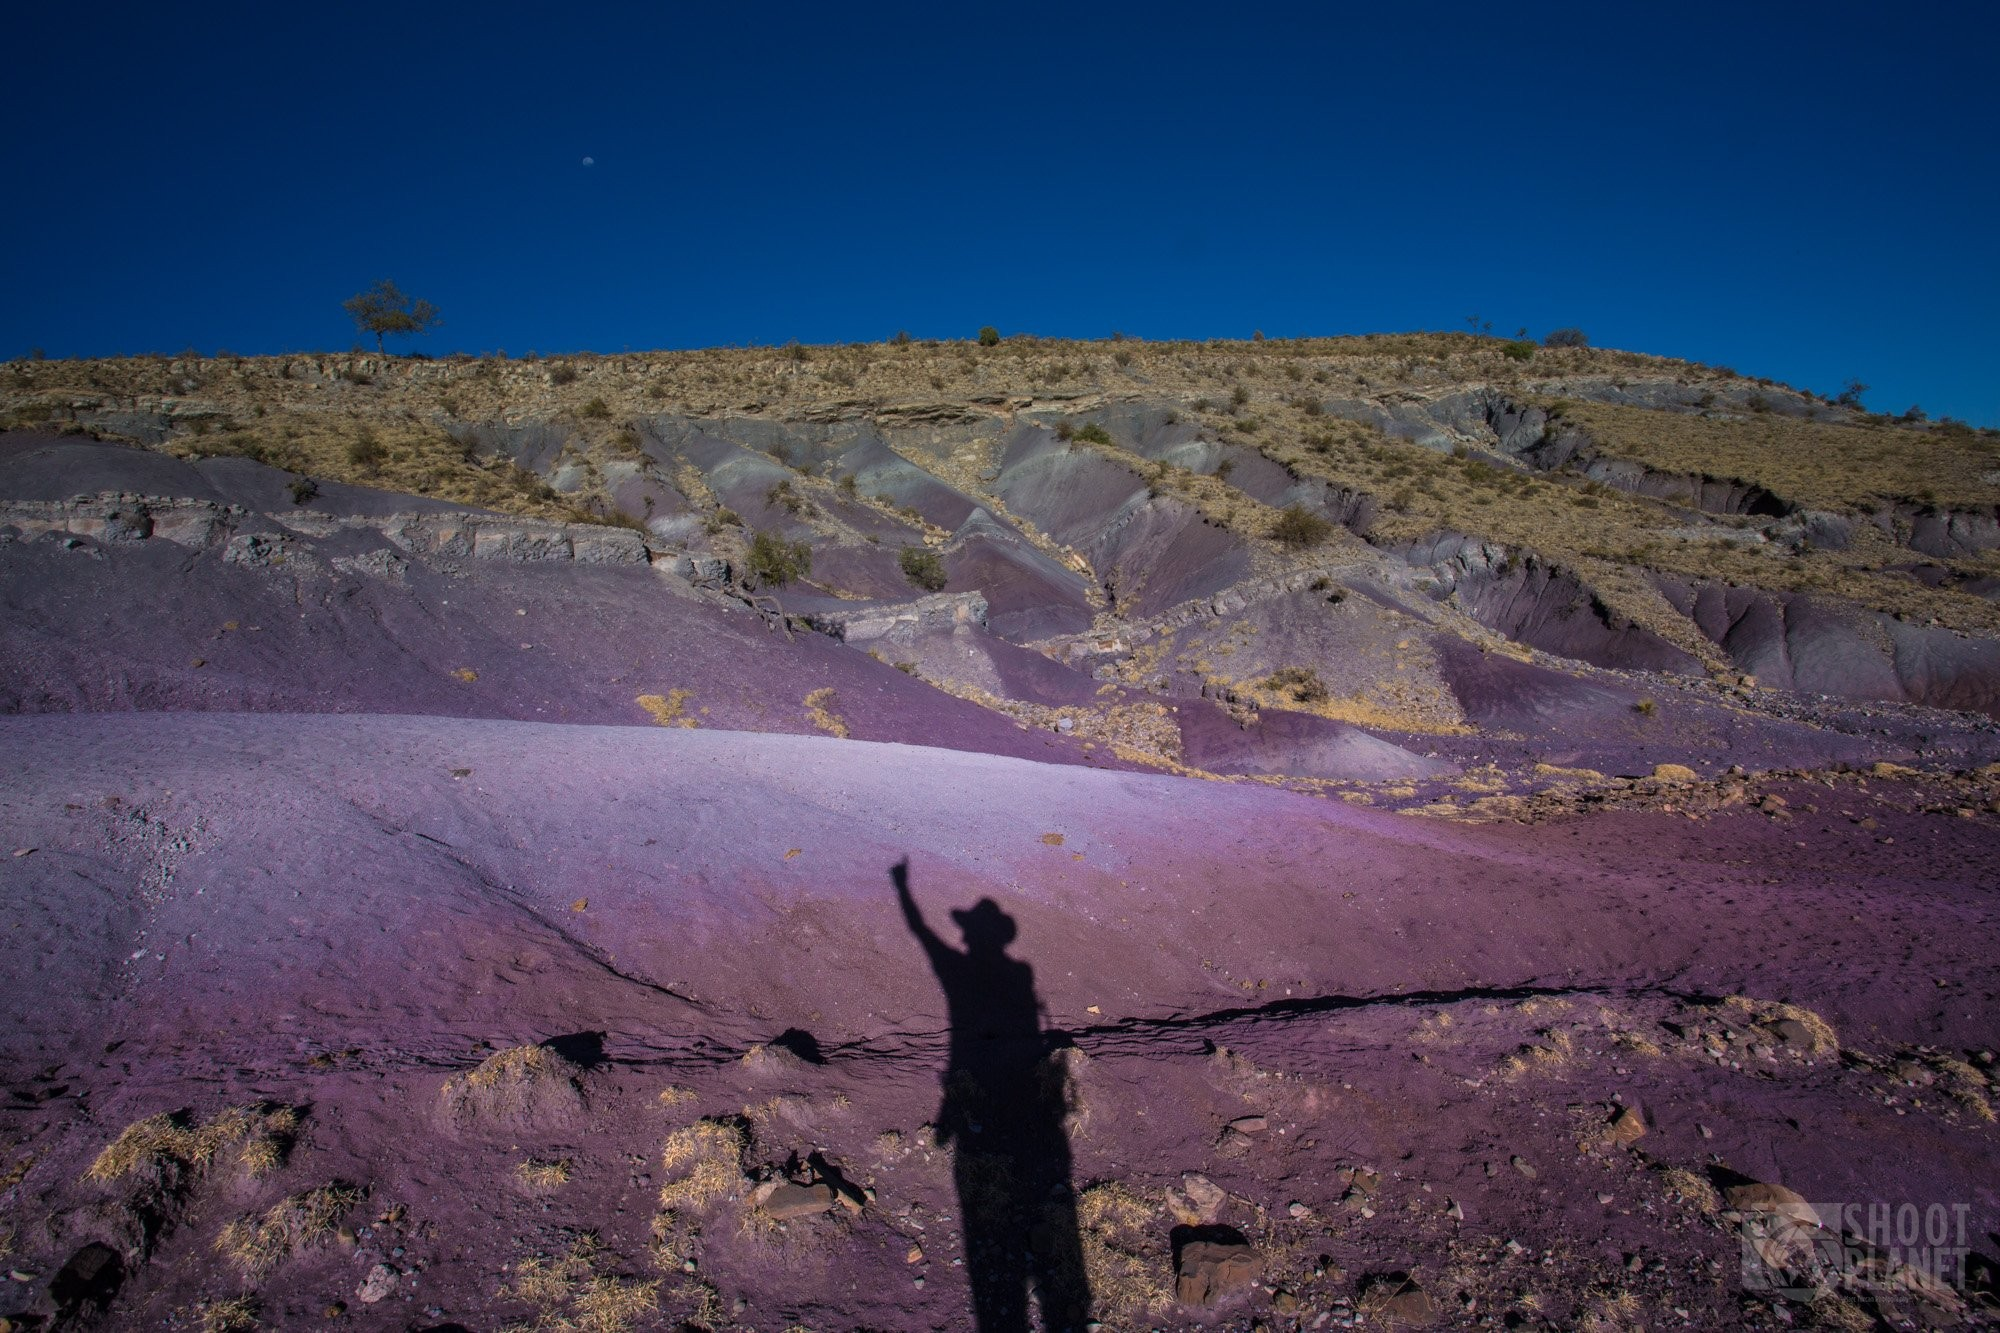 Marangua crater purple rocks shadows